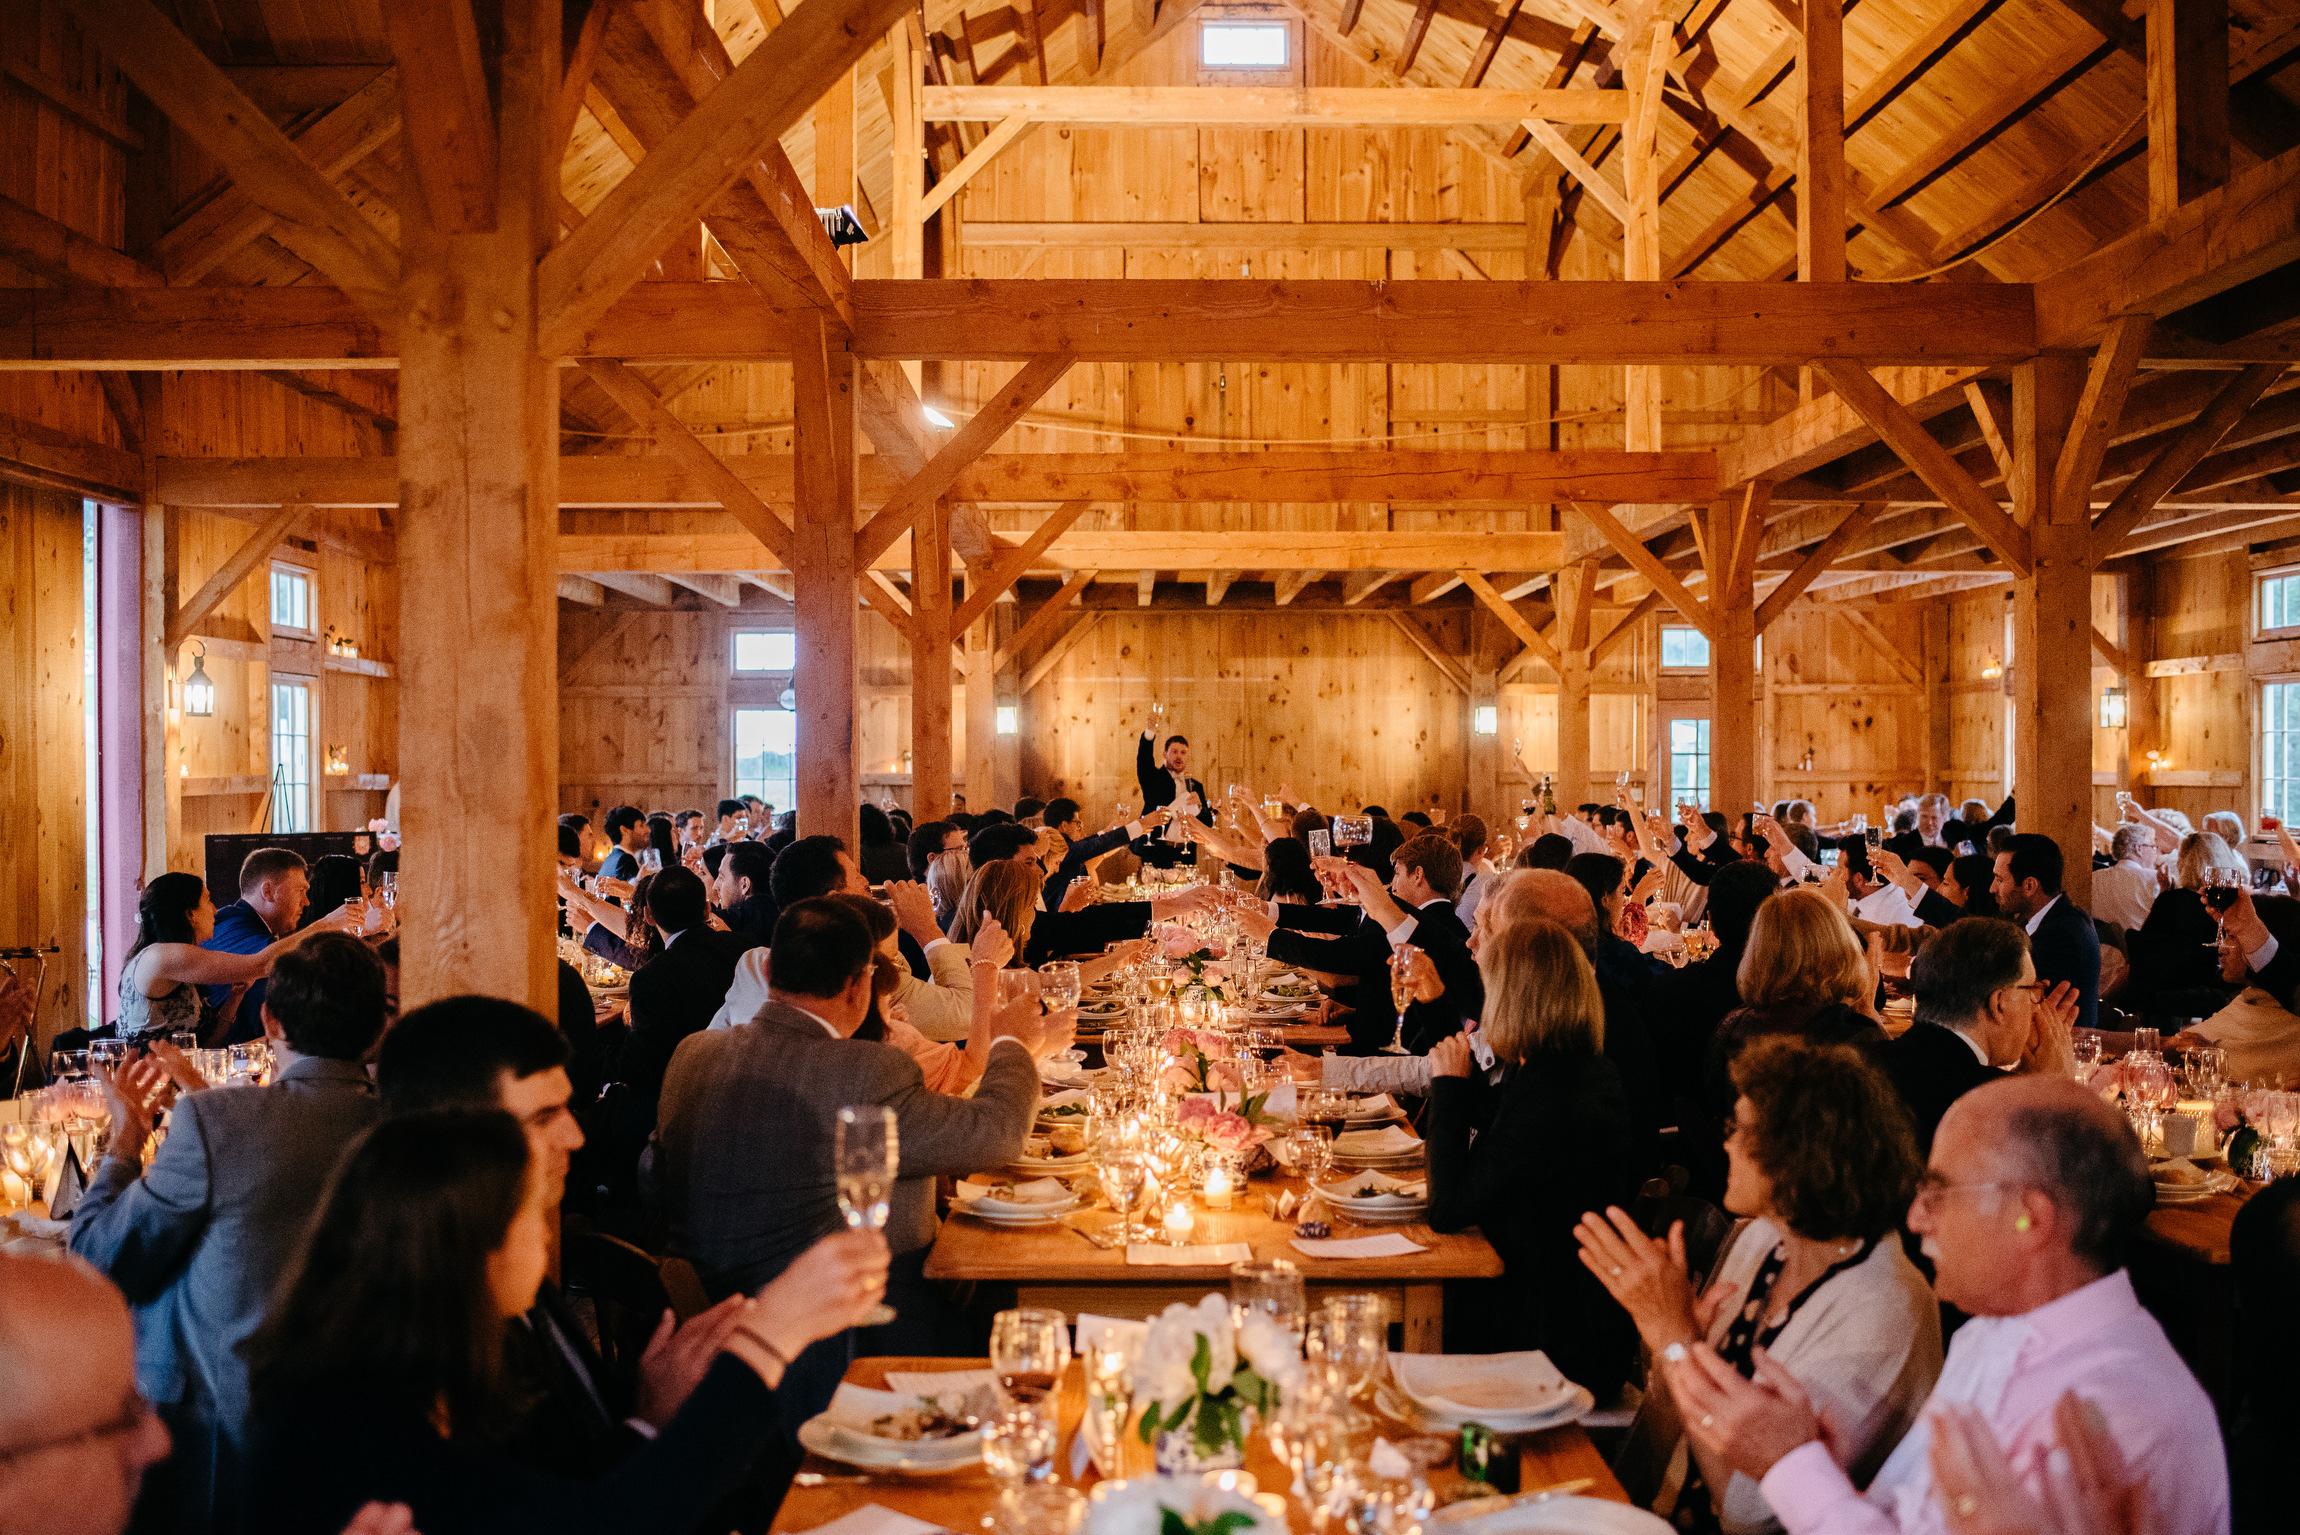 vermont_farm_wedding_photos_mikhail_glabetS_57.JPG